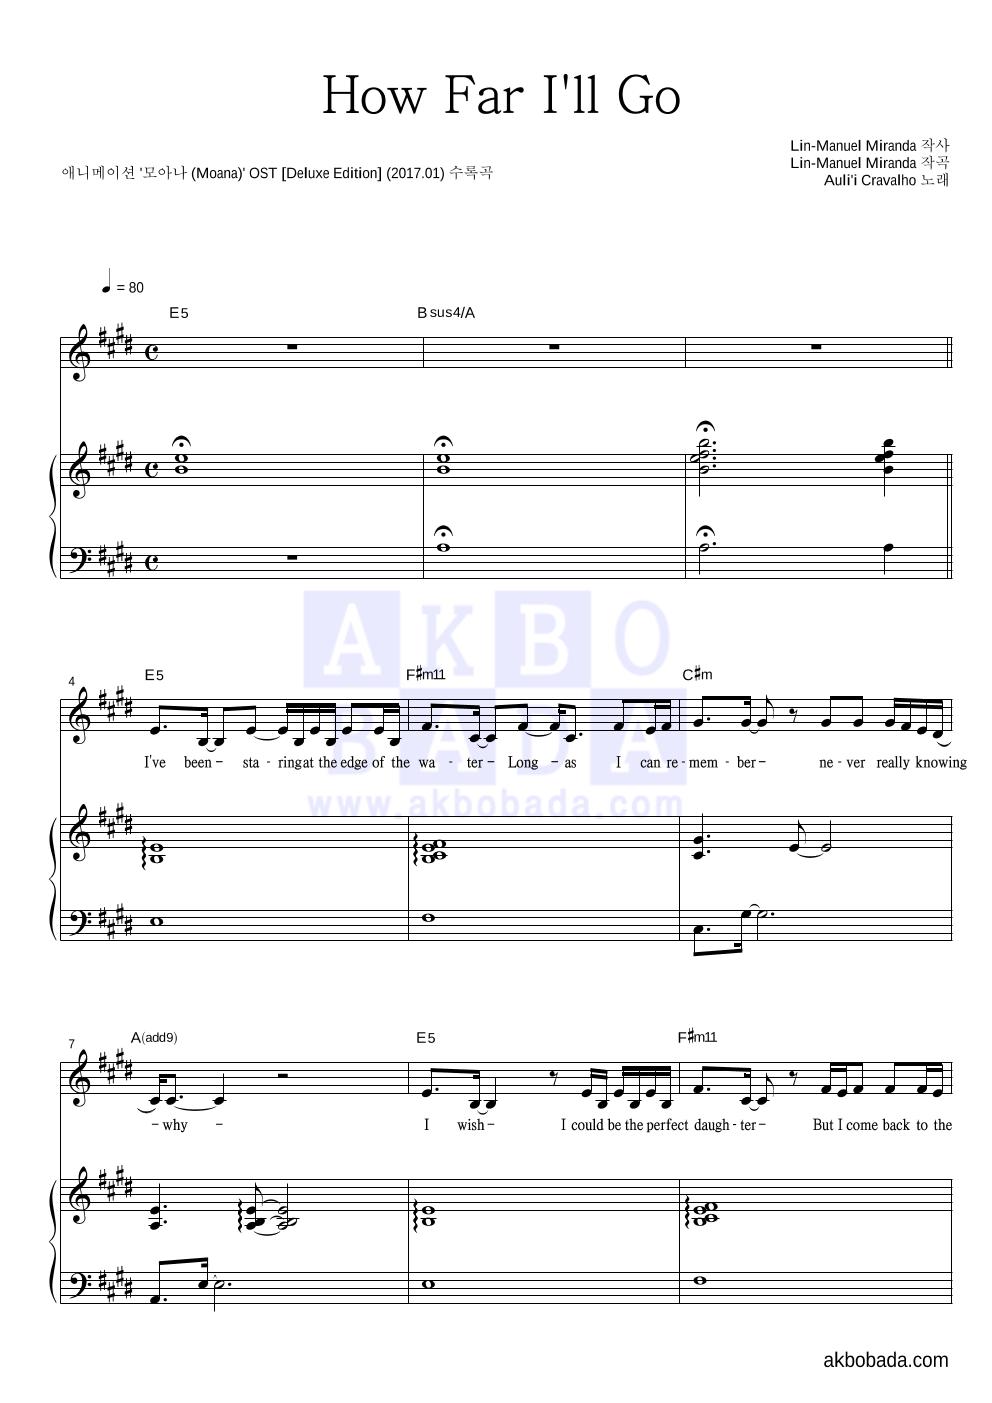 Auli'i Cravalho - How Far I'll Go 피아노 3단 악보